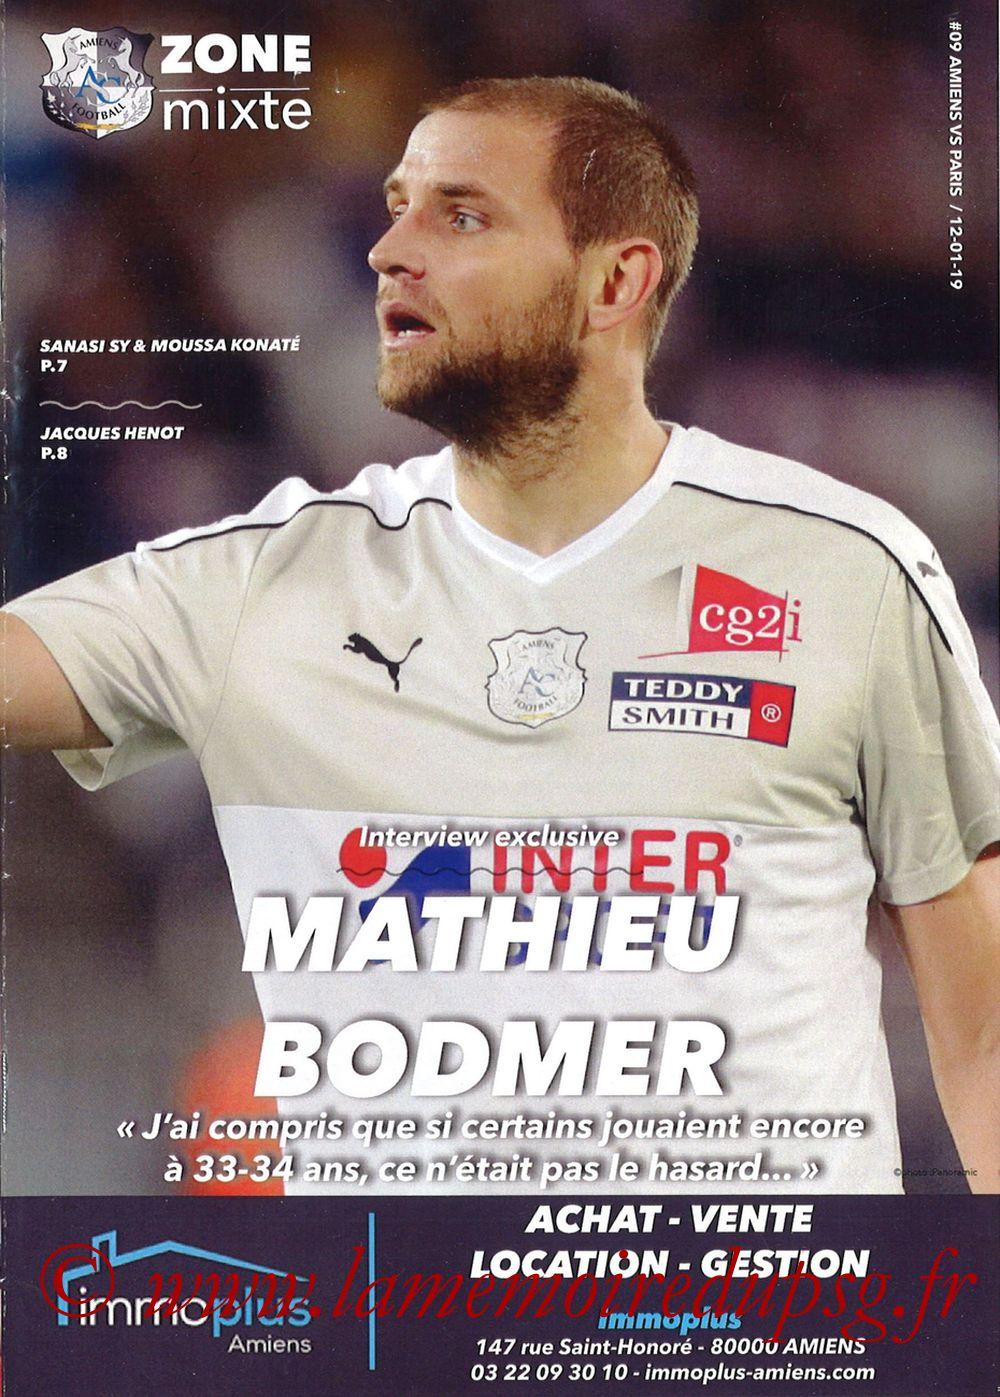 2019-01-12  Amiens-PSG (20ème L1, Zone mixte N°9)